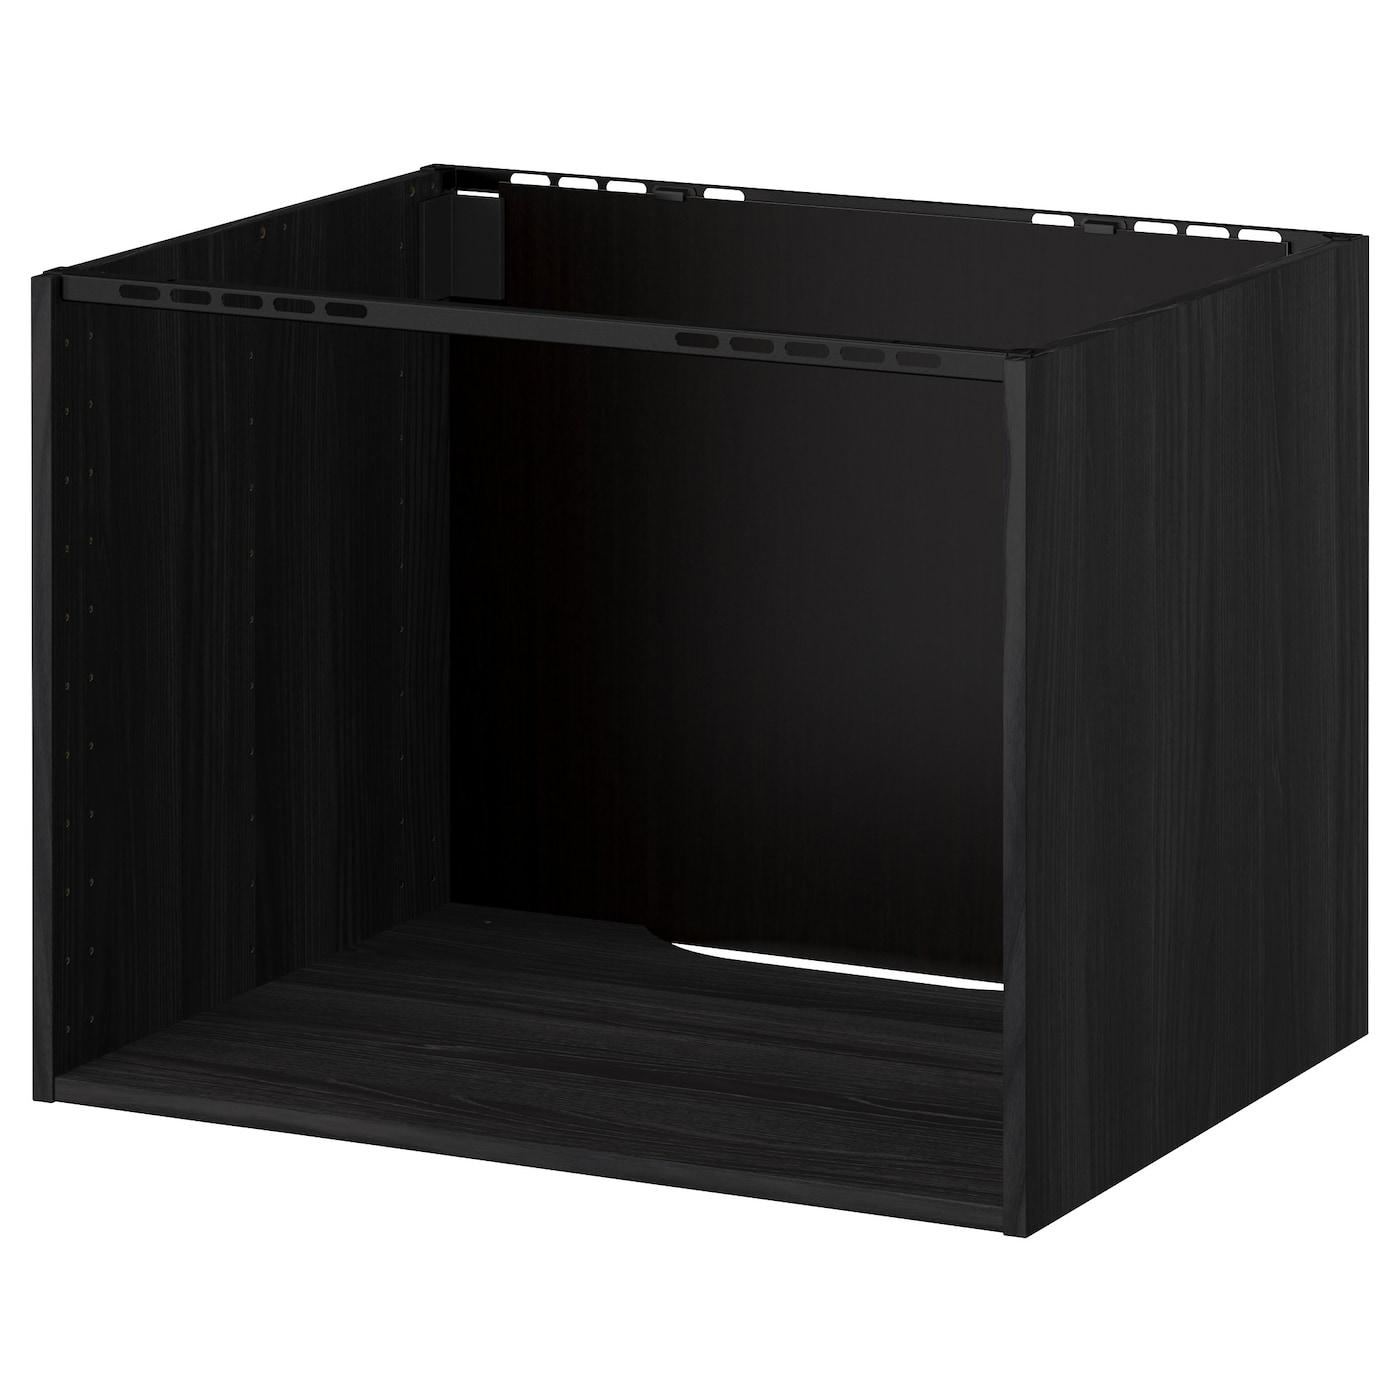 Black Built In Kitchen Cupboards: METOD Cabinet For Built-in Hob/sink Wood Effect Black